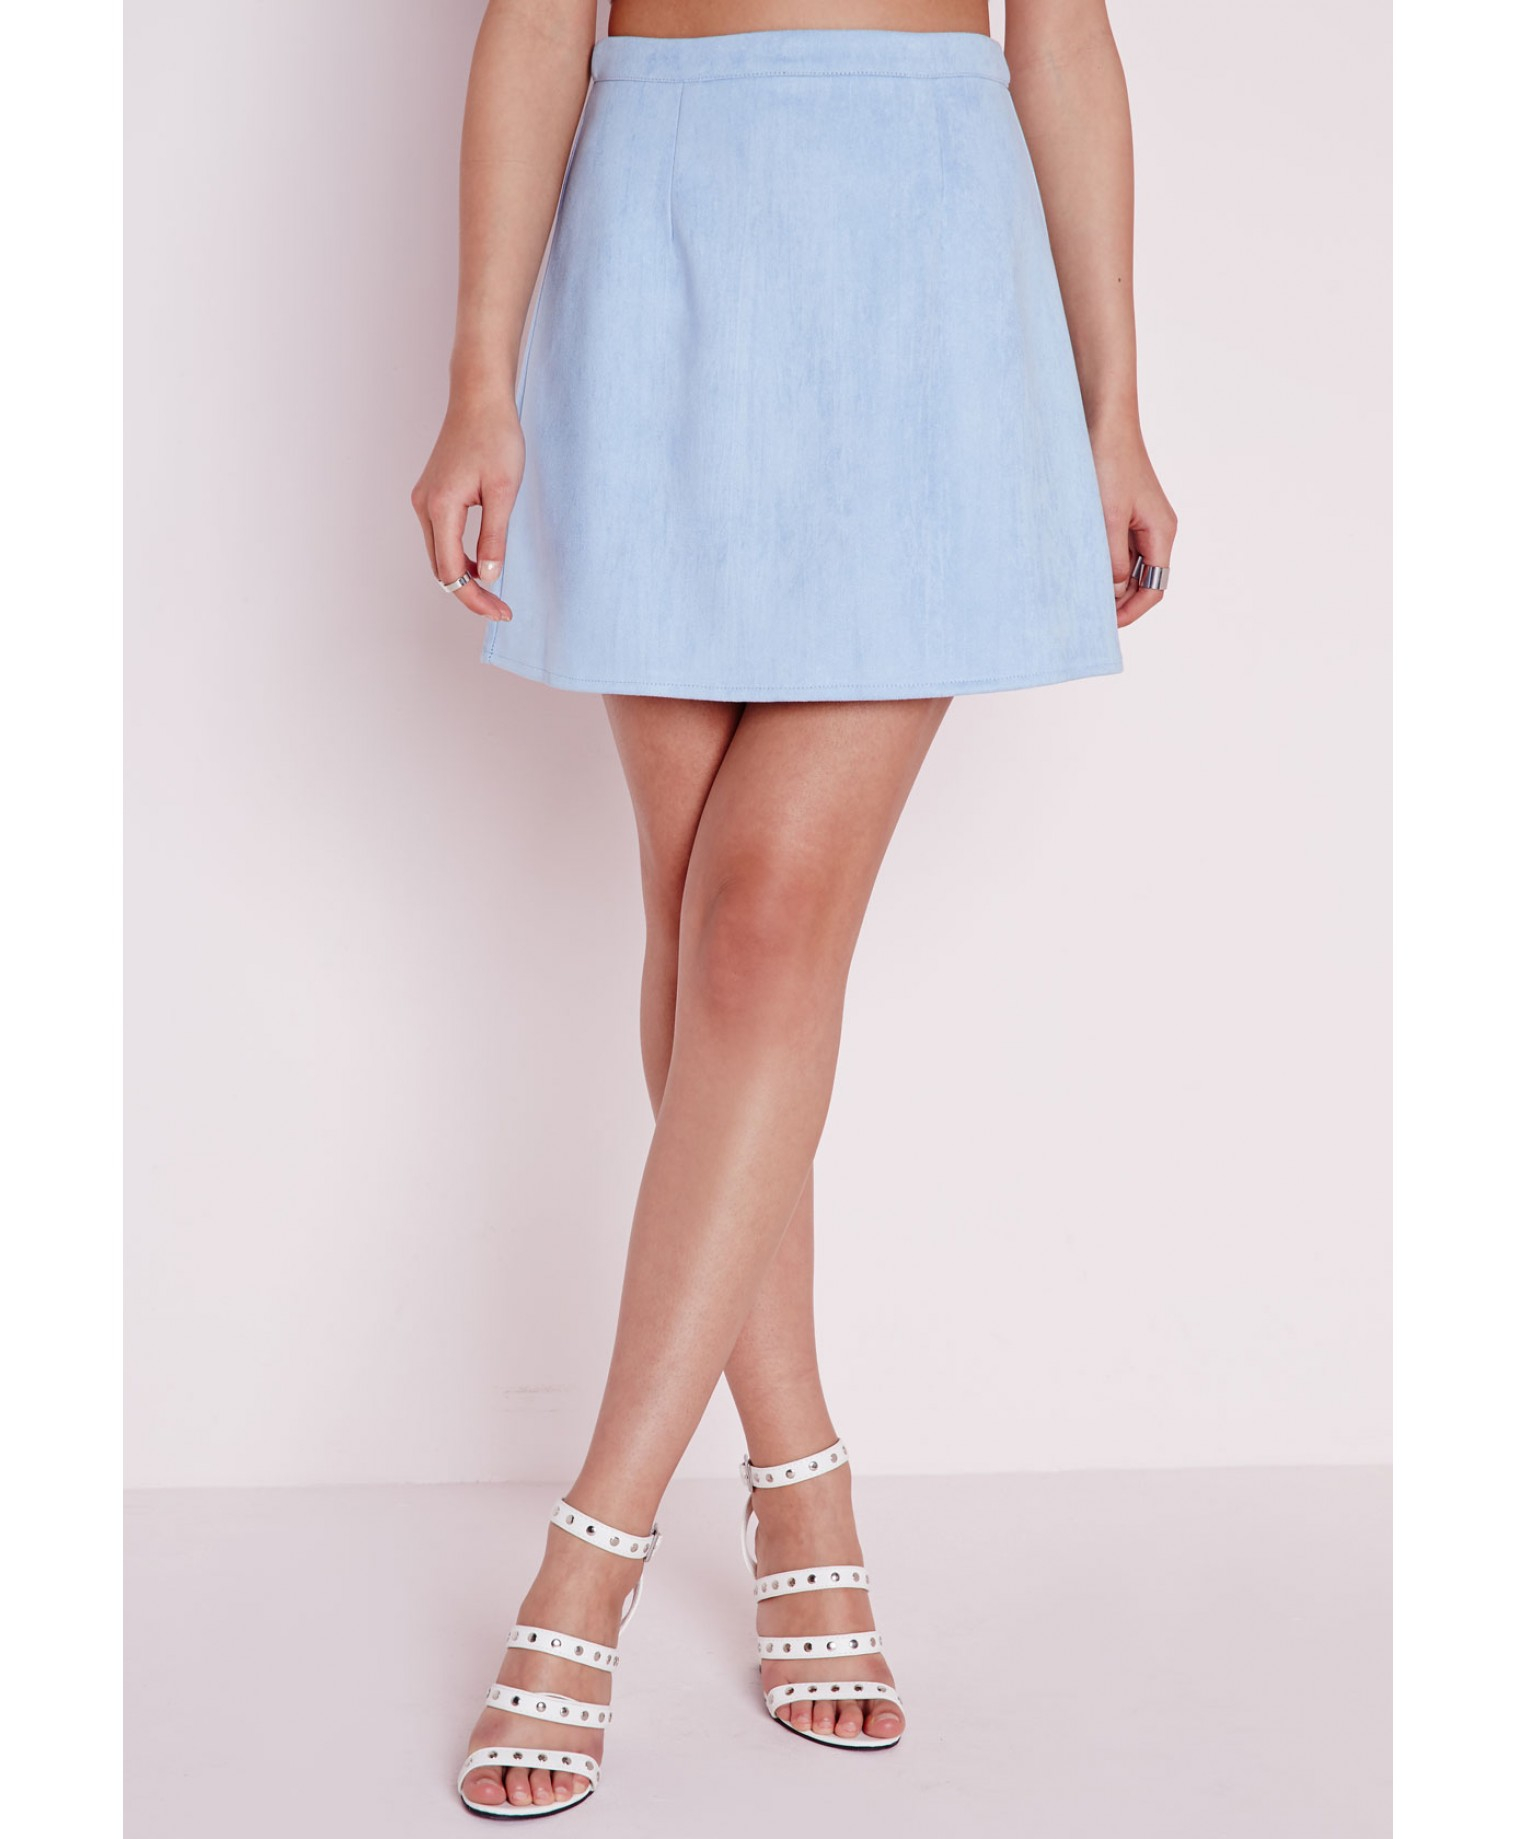 4db24d475 Light Blue A Line Skirt - Best Picture Of Blue Imageve.Org